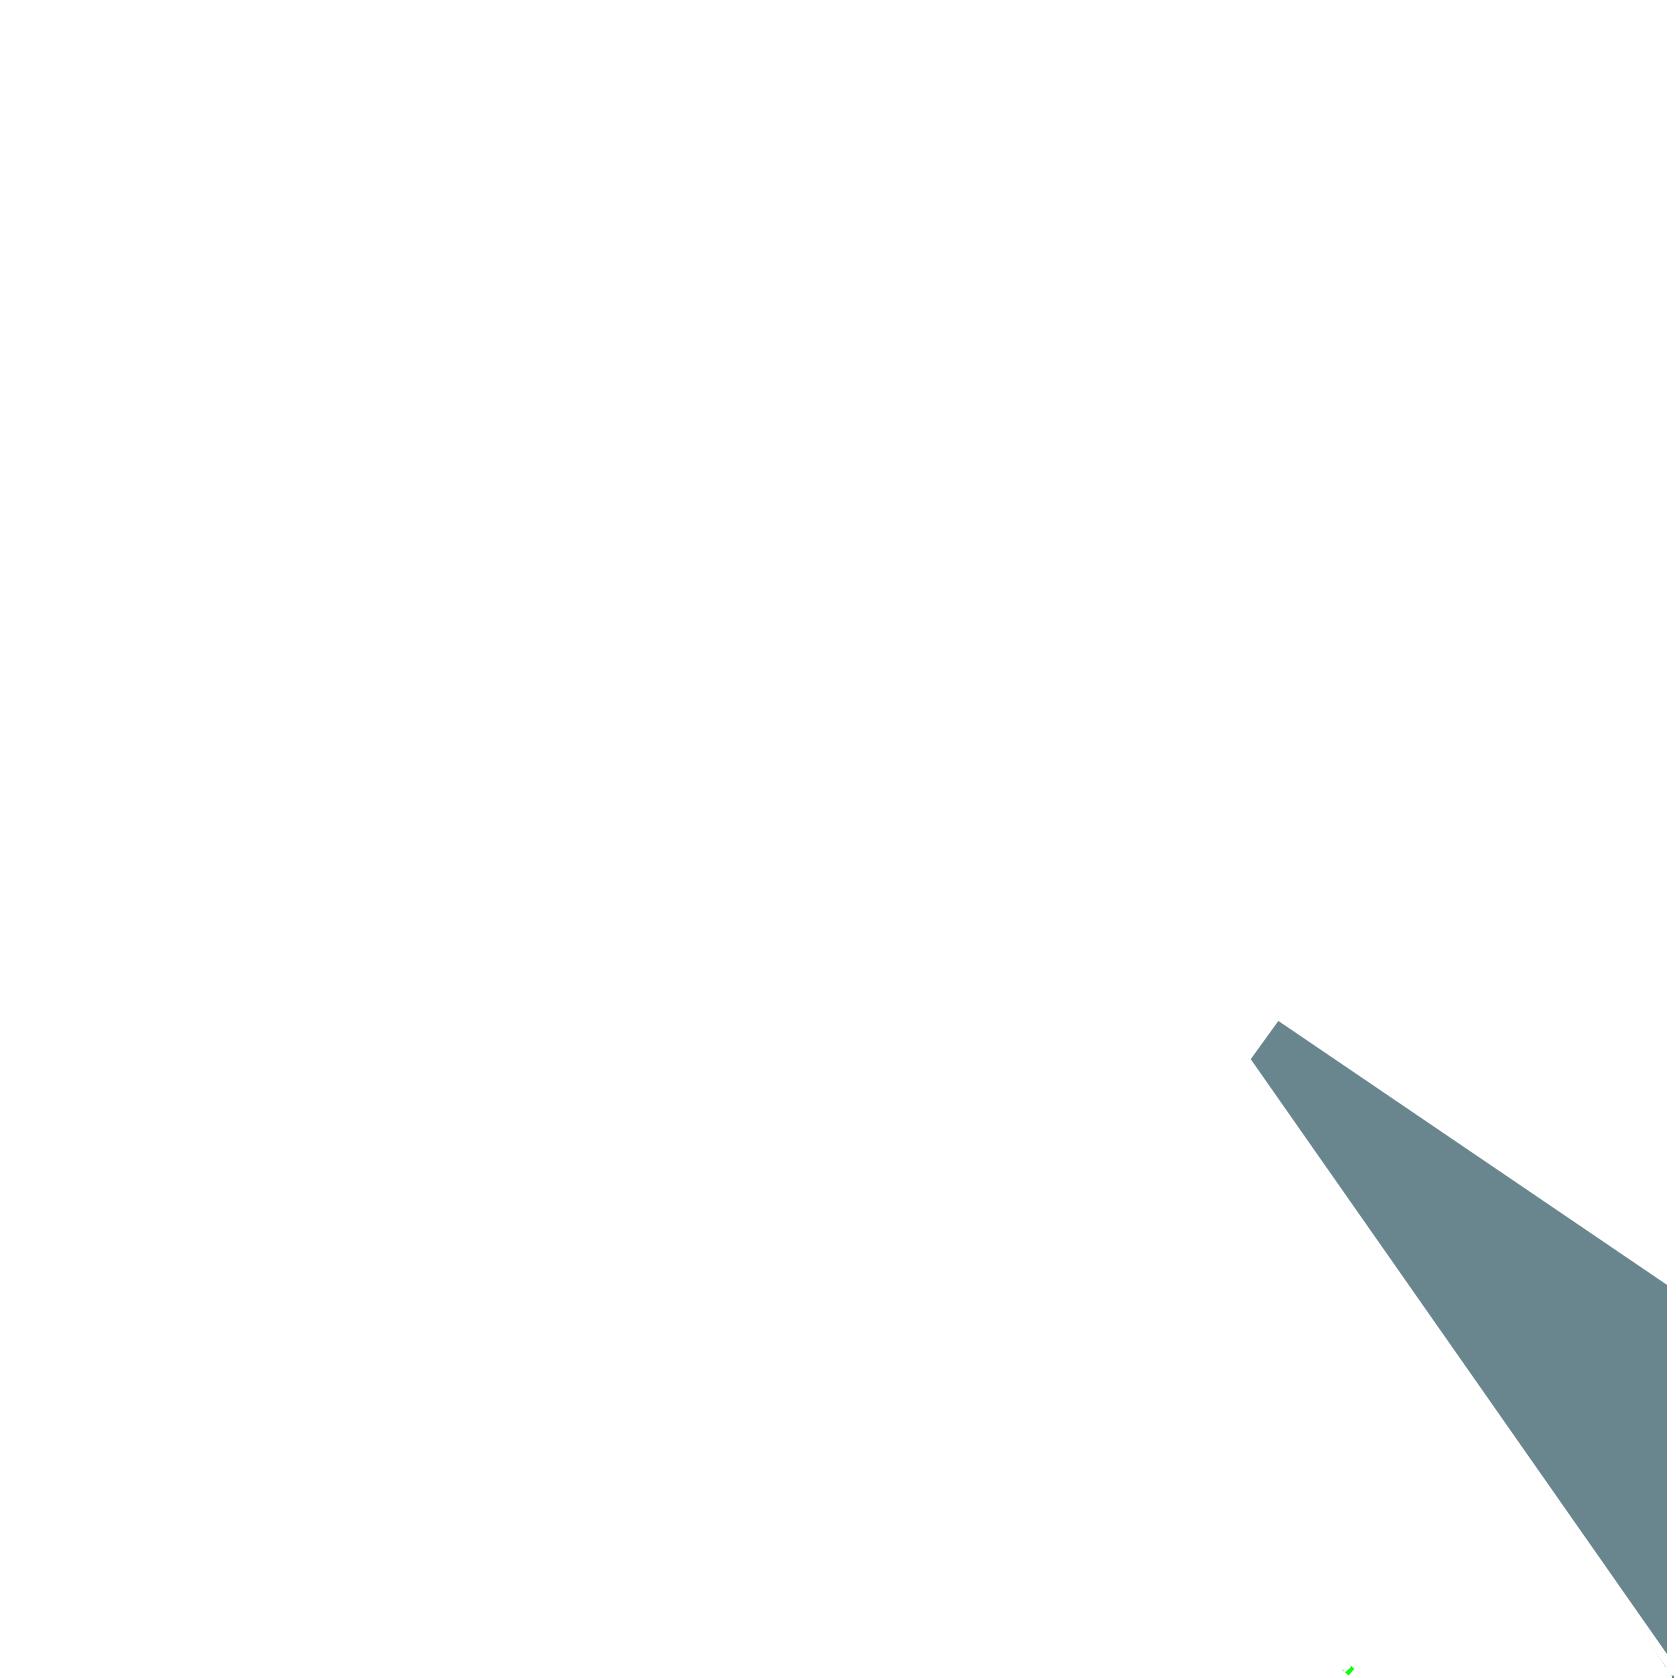 don_logo2_white_thin.png